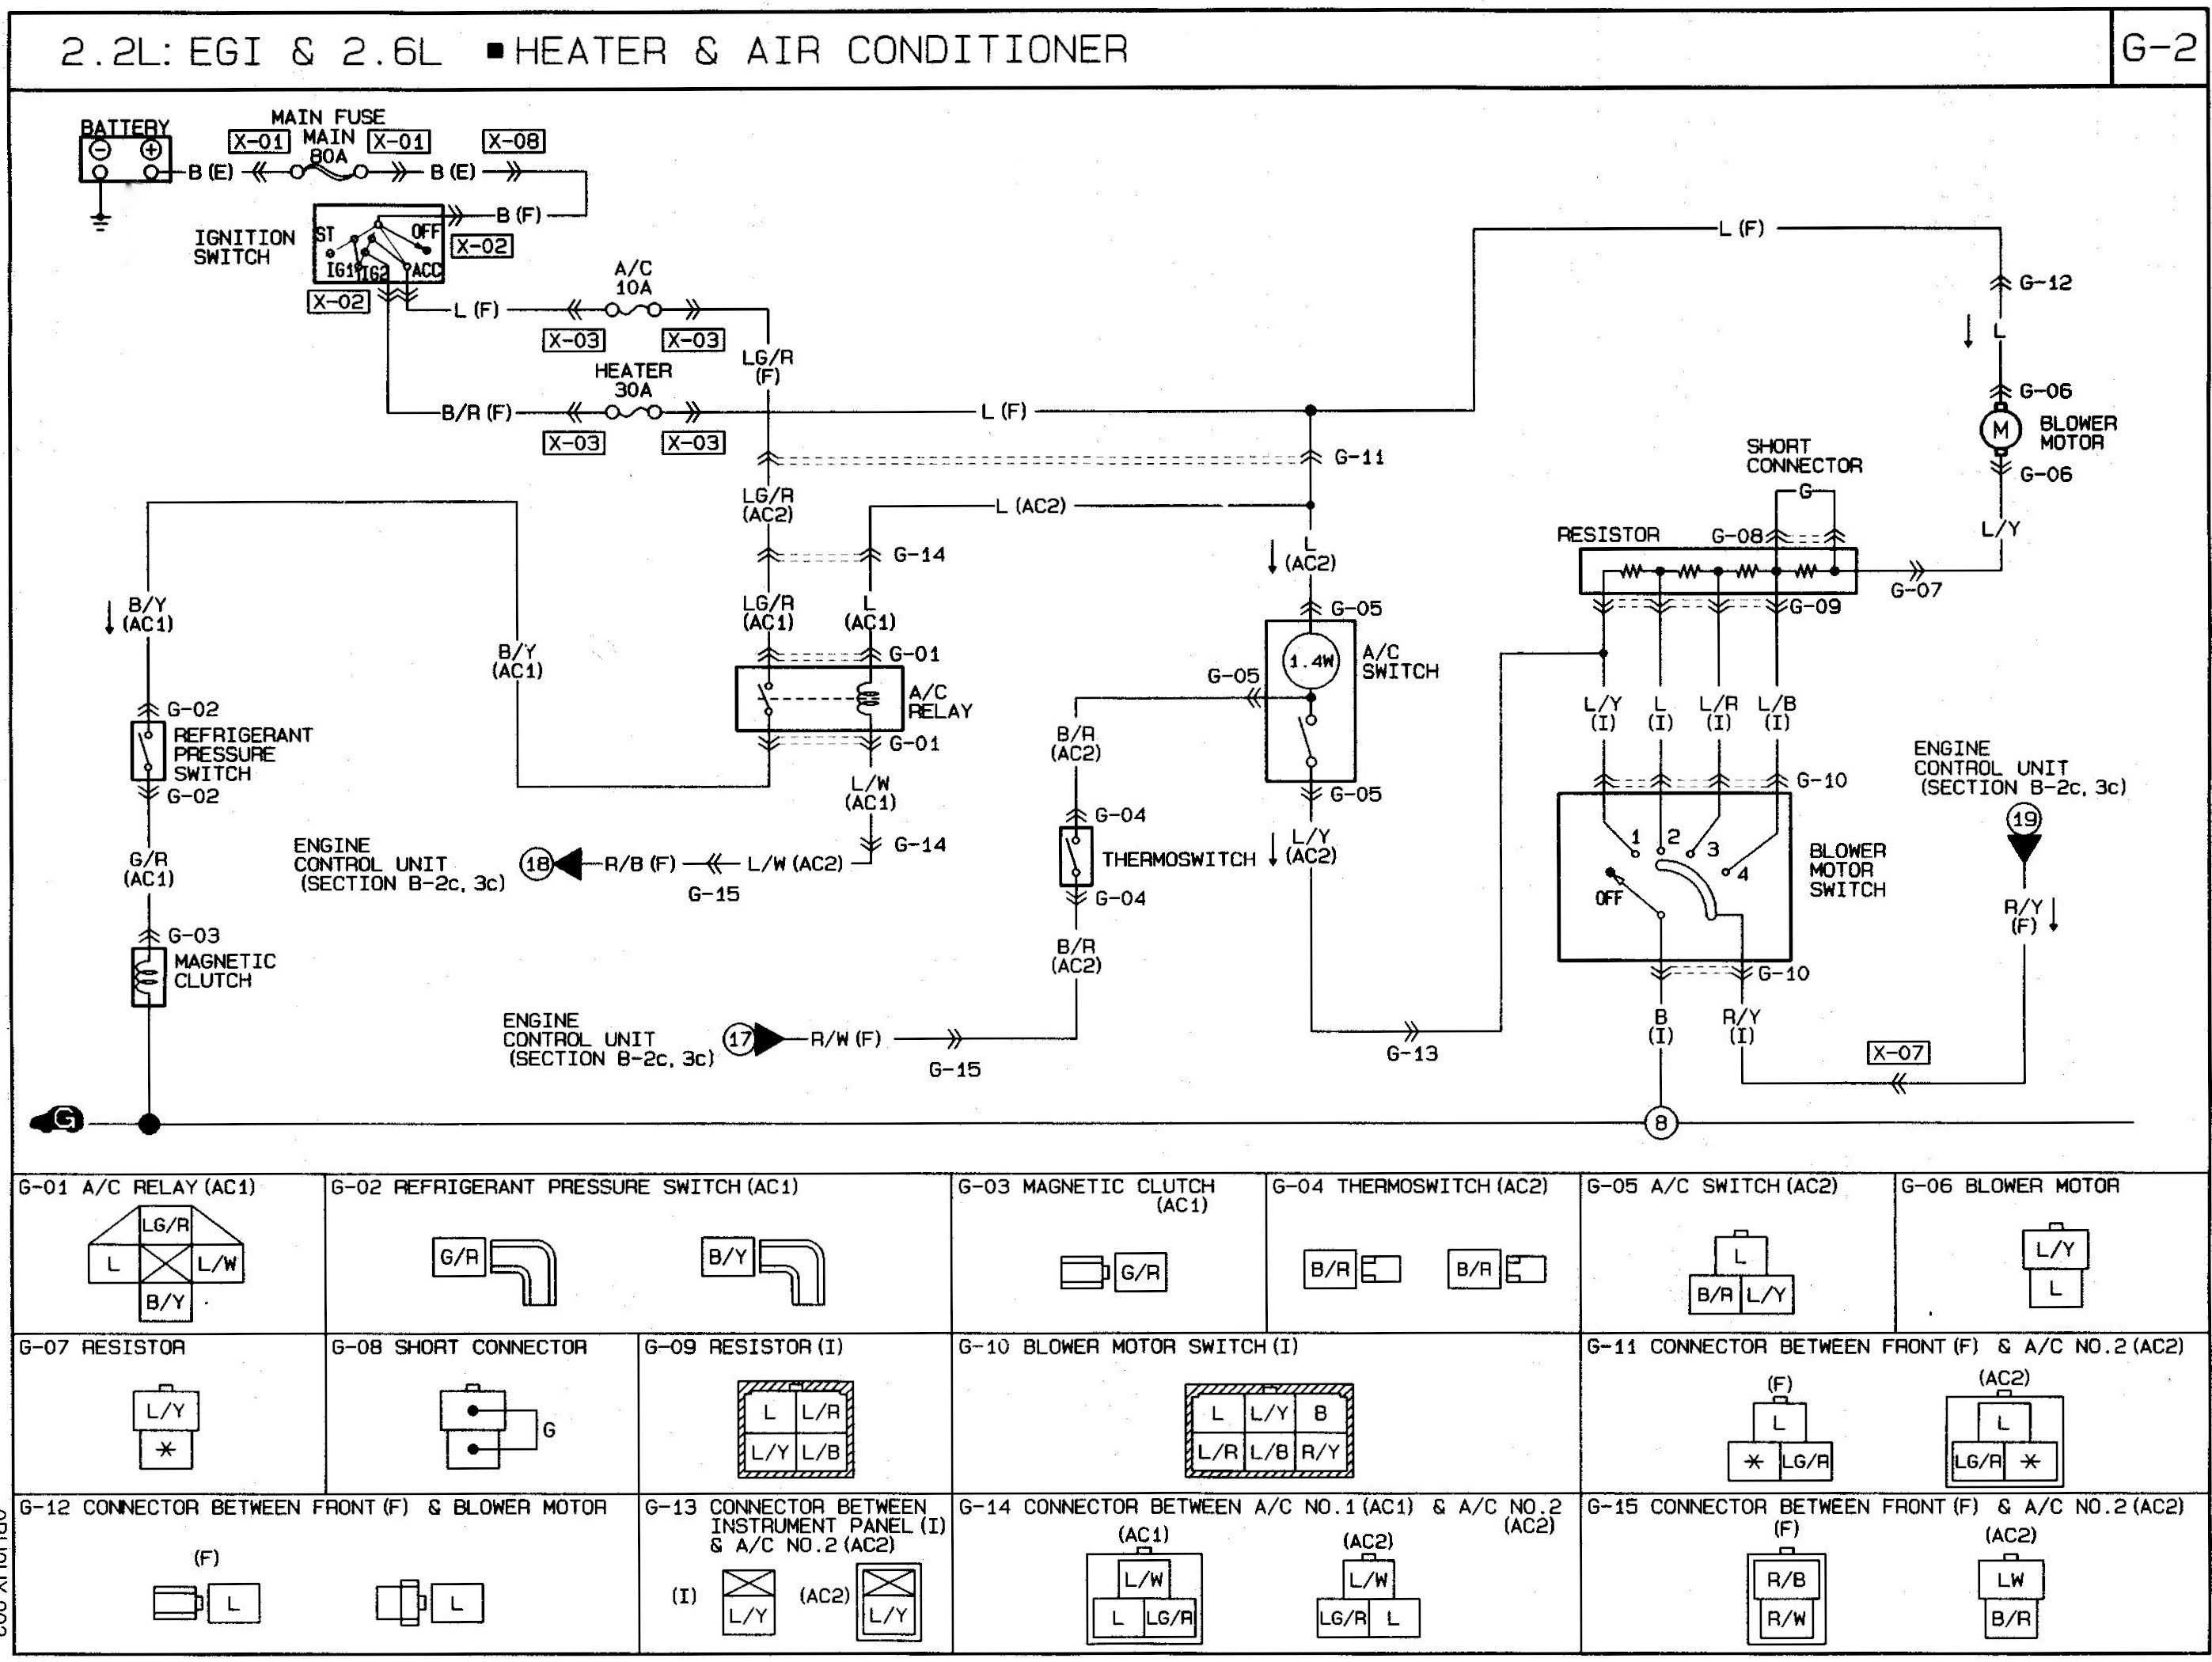 carrier split ac wiring diagram Download-Carrier Split Ac Wiring Diagram Webtor Me Mesmerizing 20-o